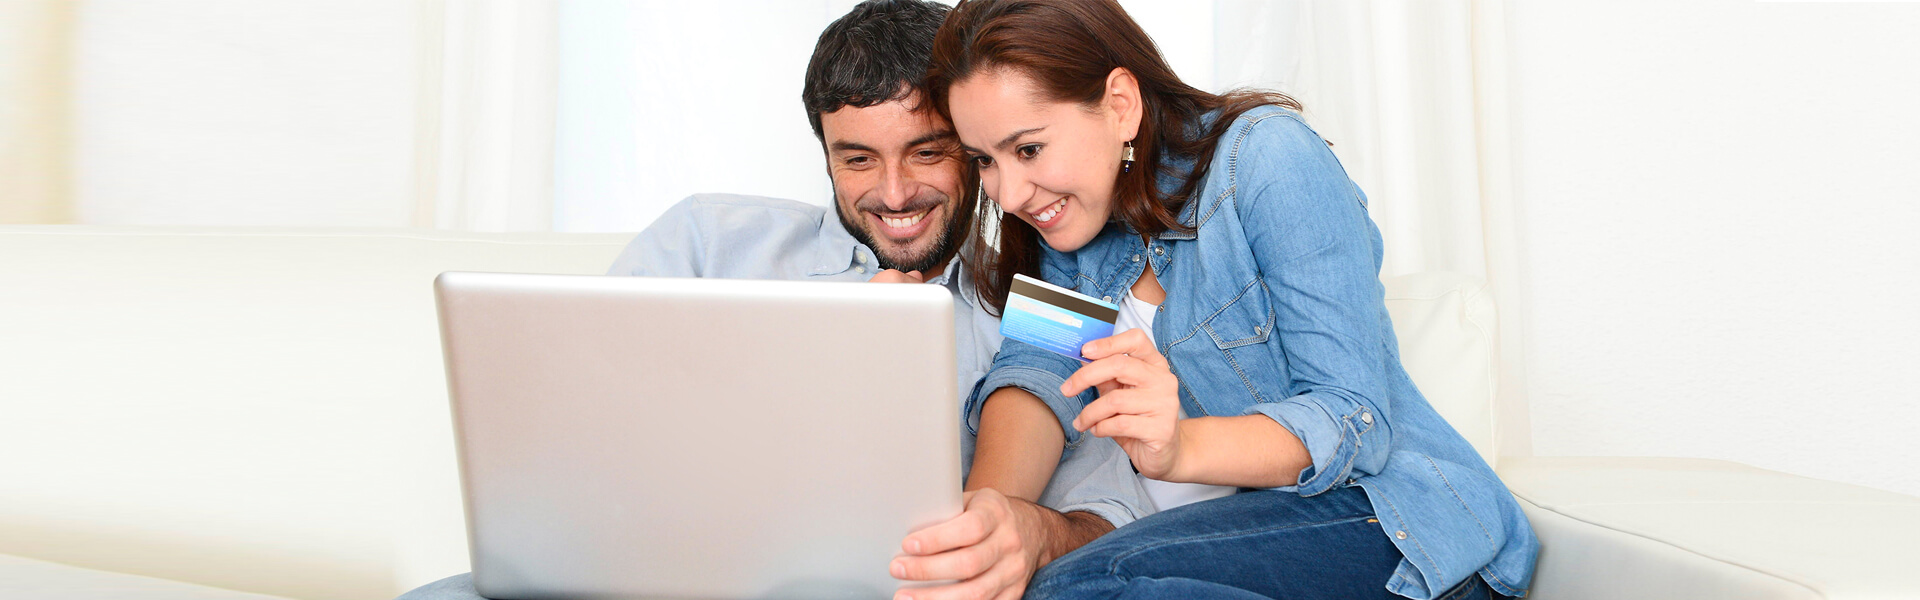 Financial Marketing - Banking to Latinos